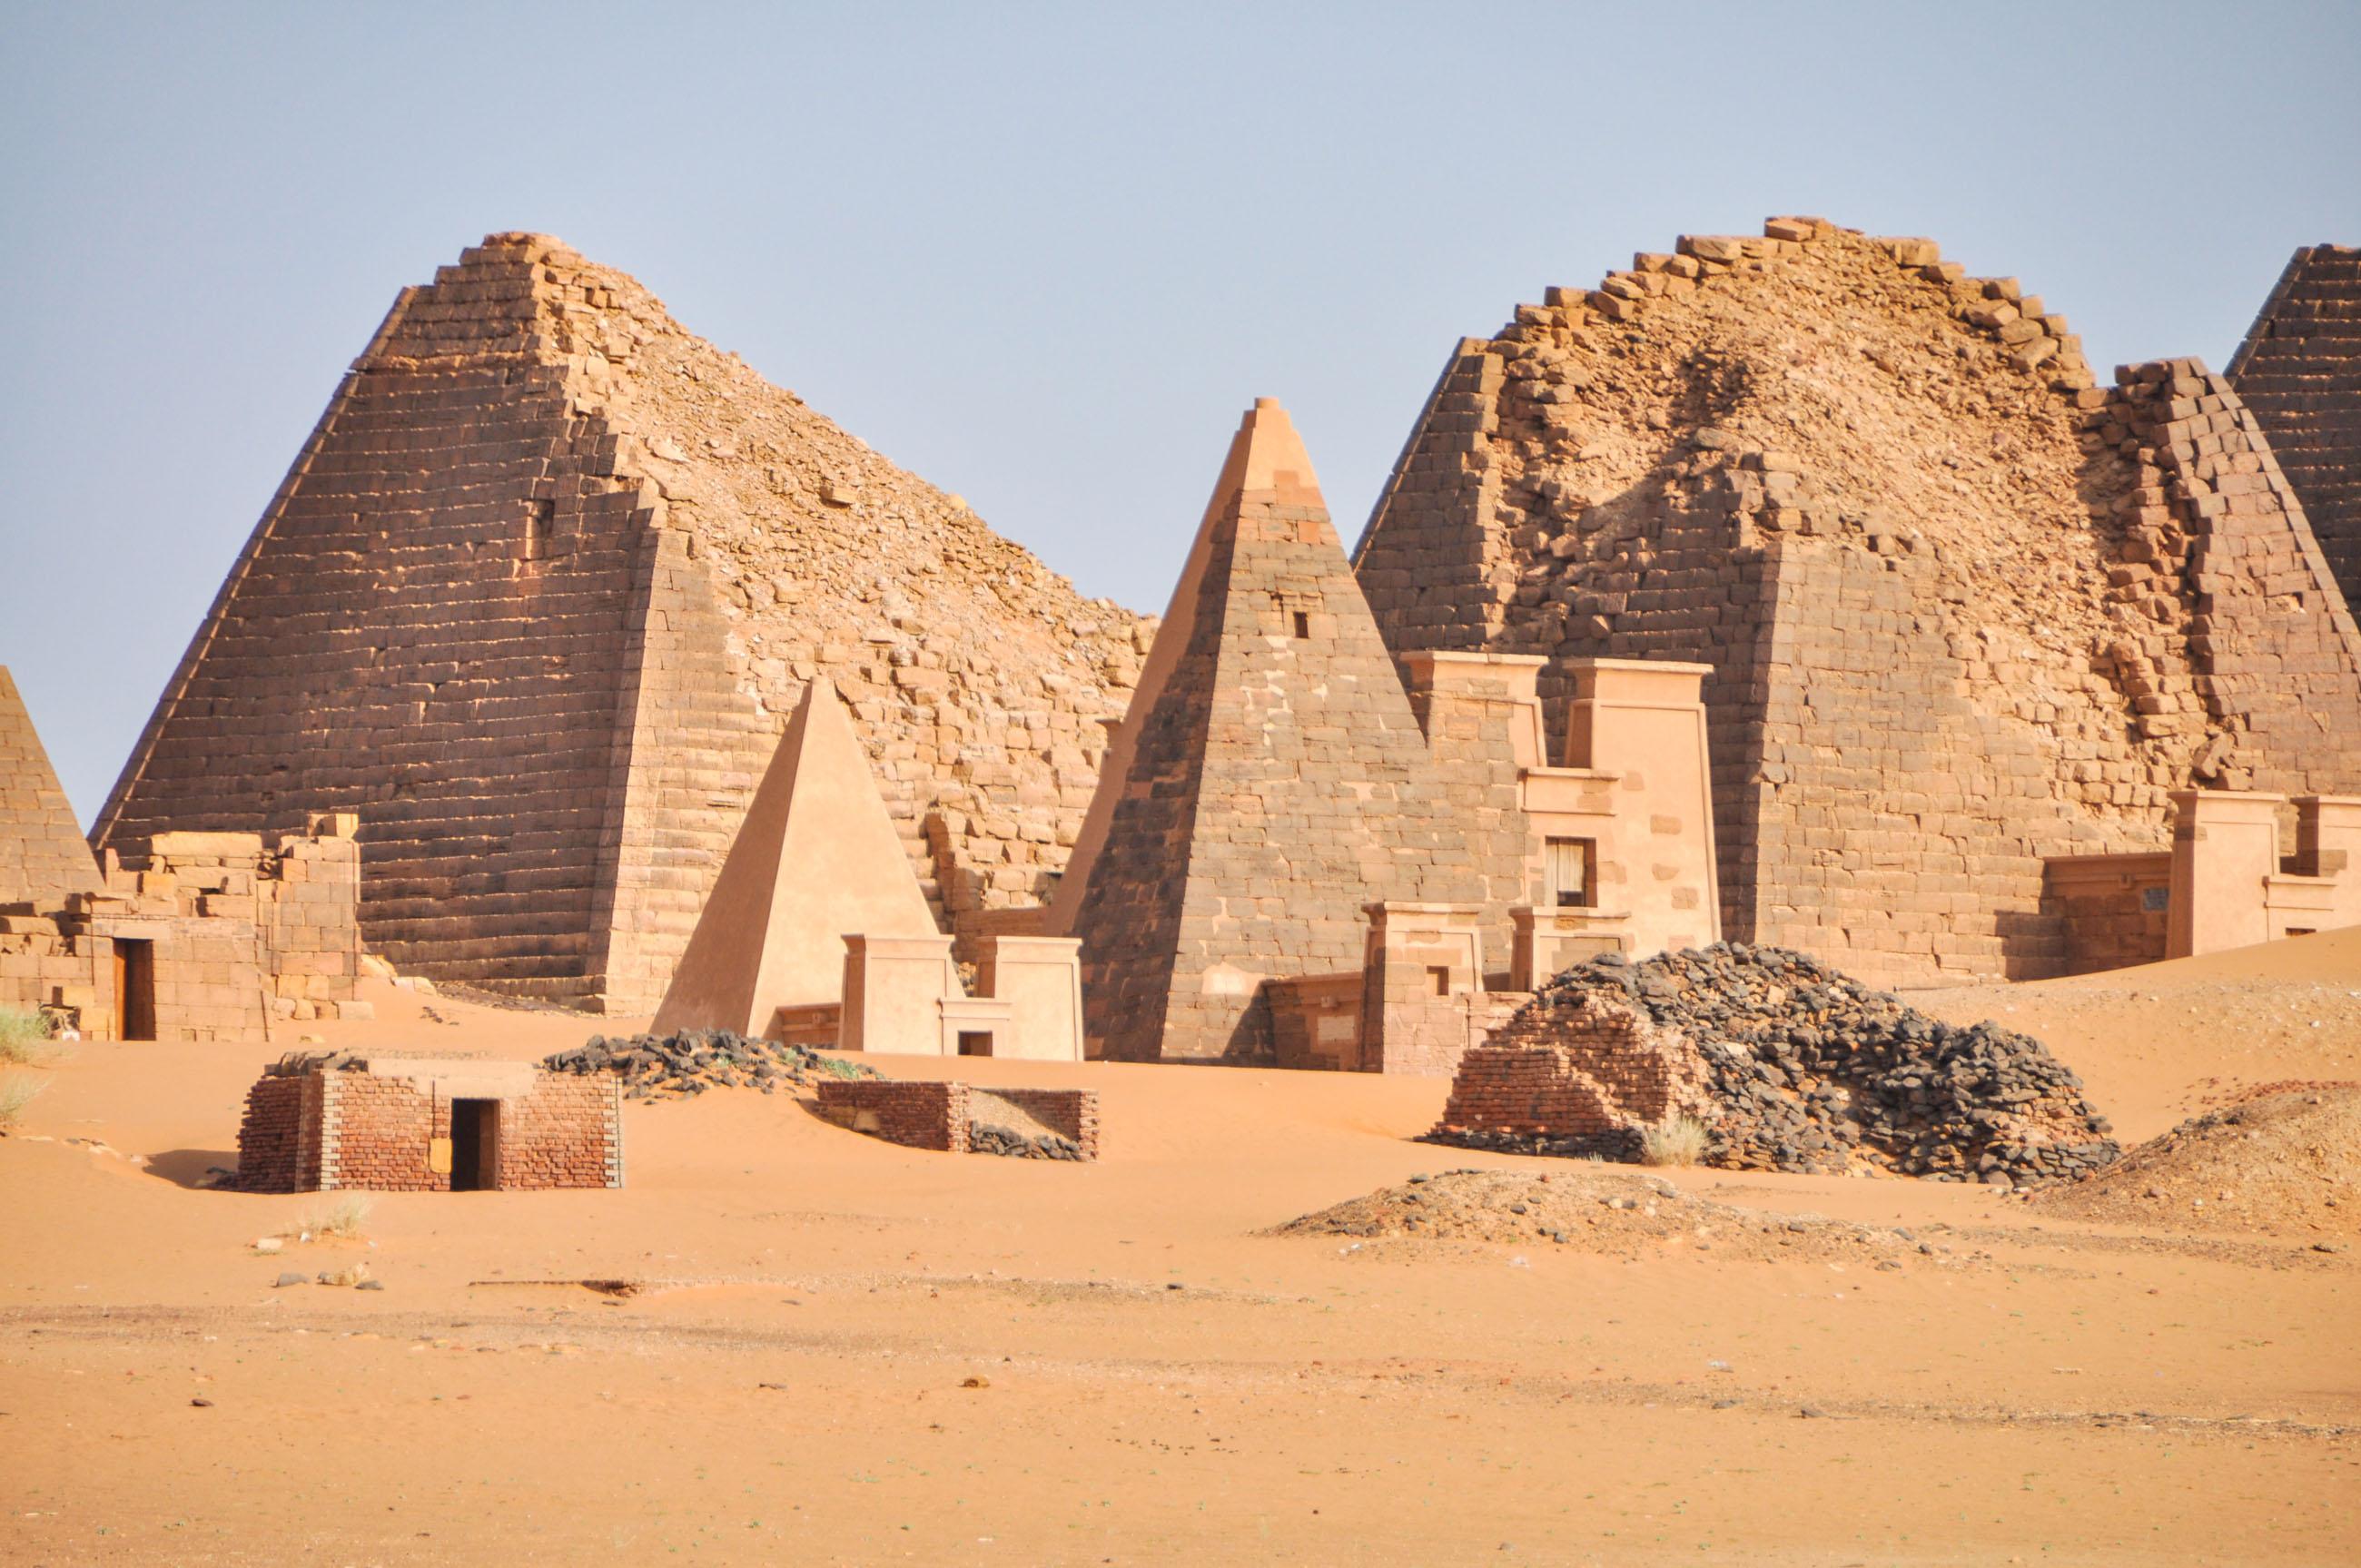 https://bubo.sk/uploads/galleries/17820/tomaskubus_sudan_dsc_0114.jpg